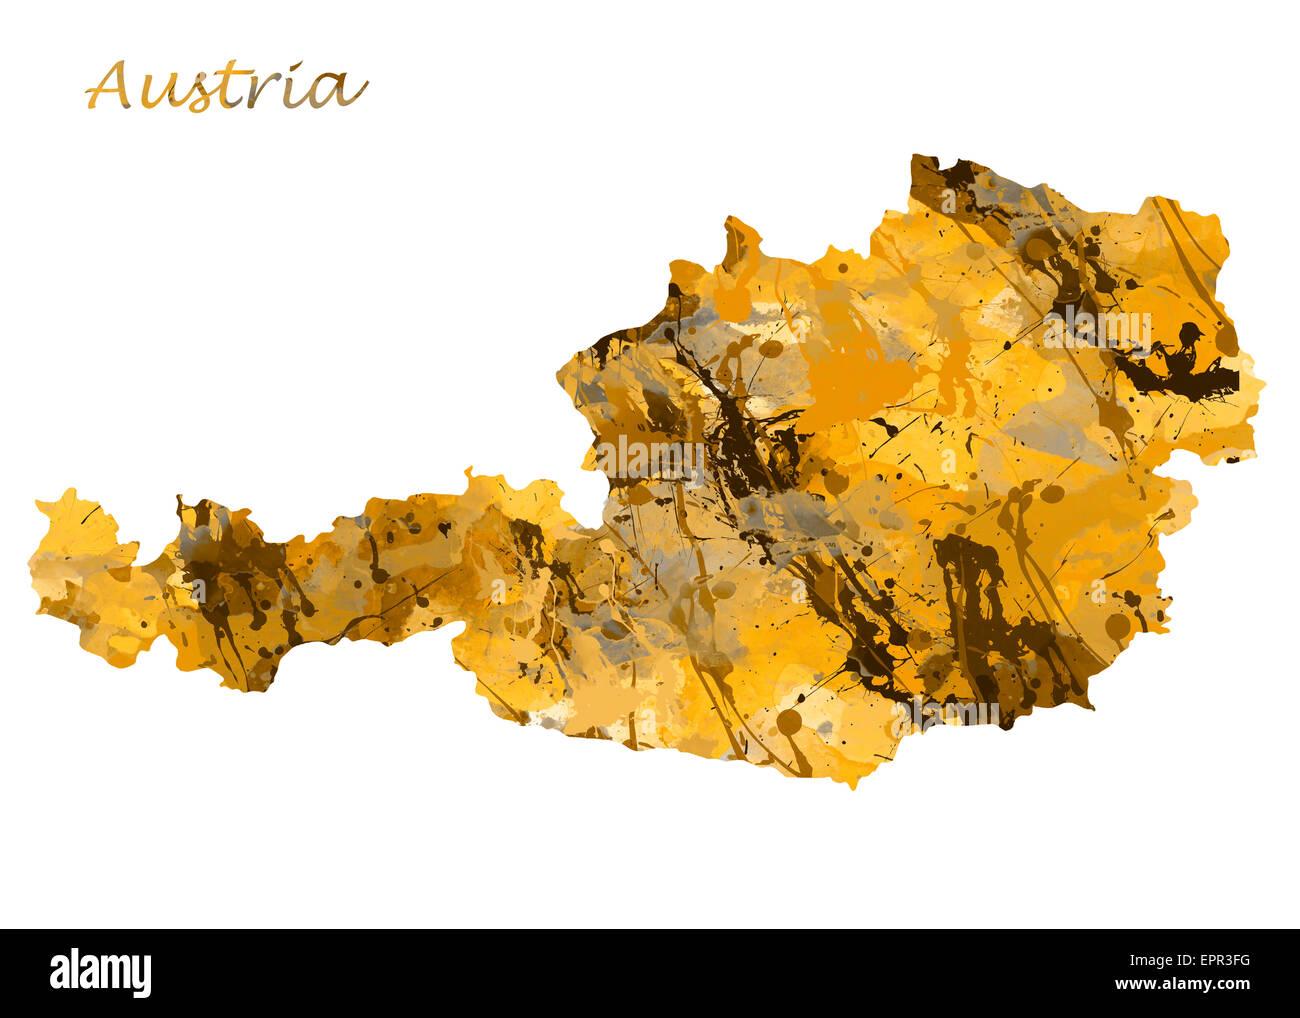 Austria Watercolor Map. Beautiful Wall Art / Home Decor Canvas ...